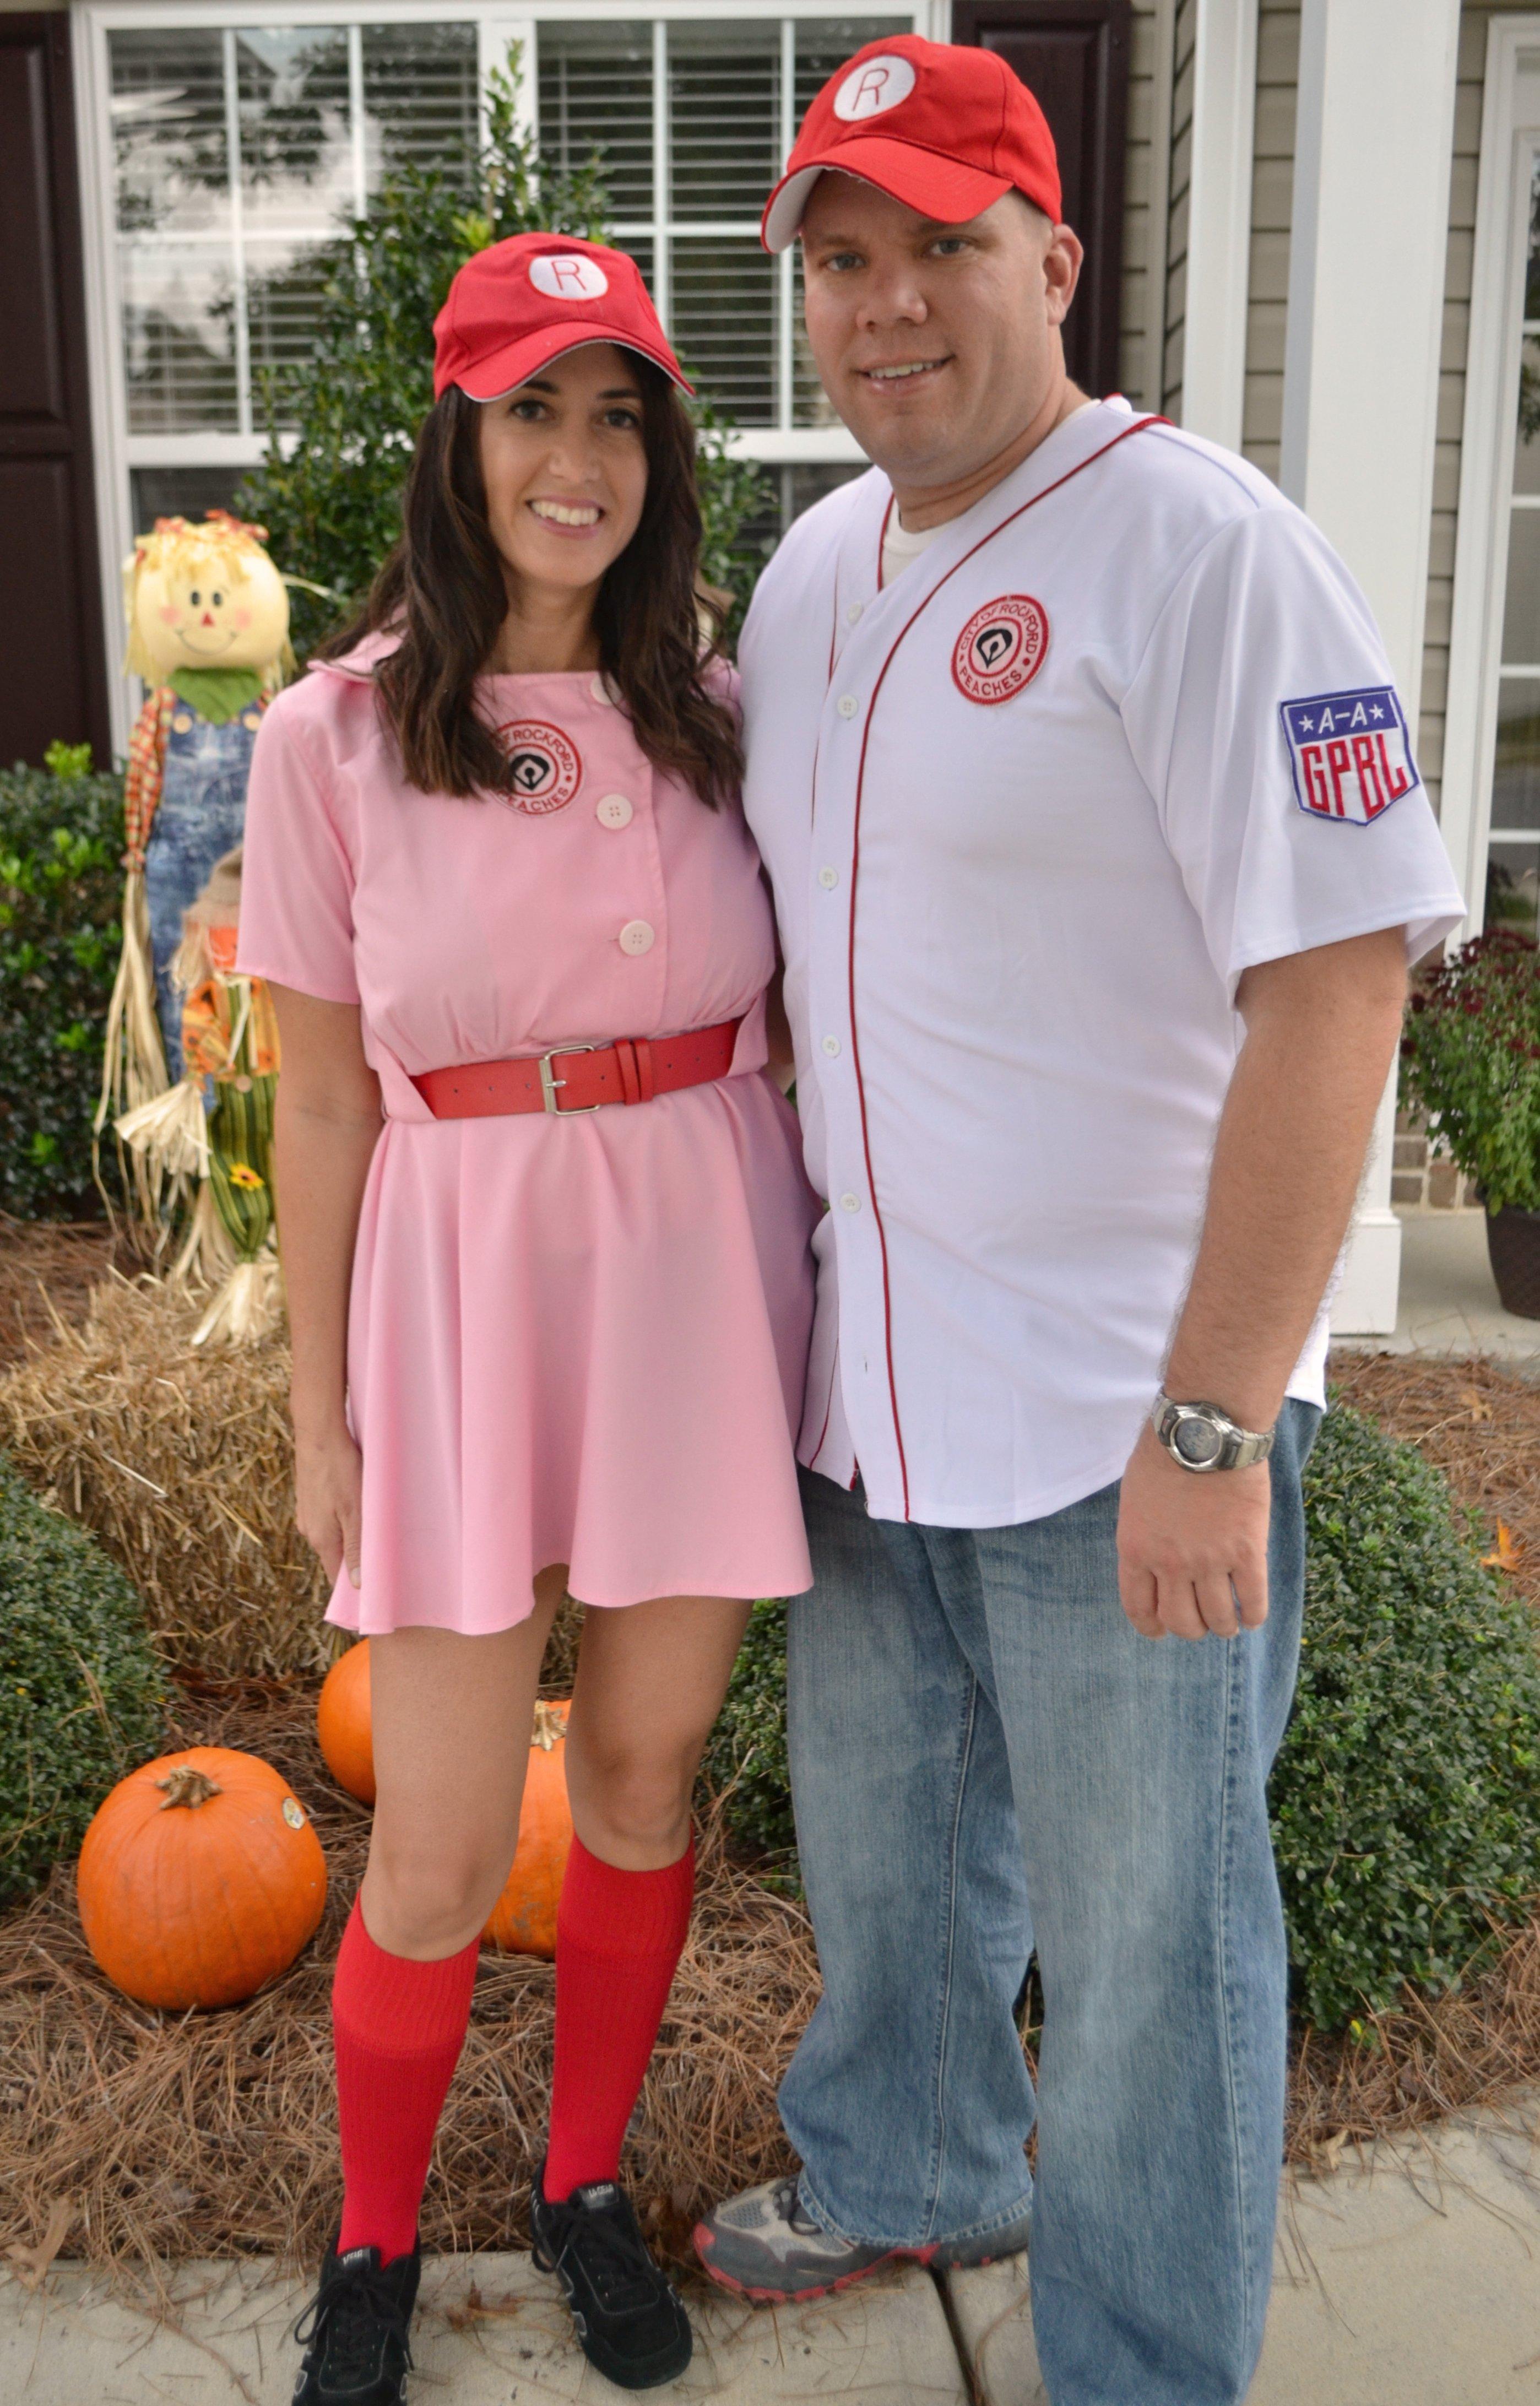 A League Of Their Own Halloween Costume | League Of Their Own Halloween Costume Halloween